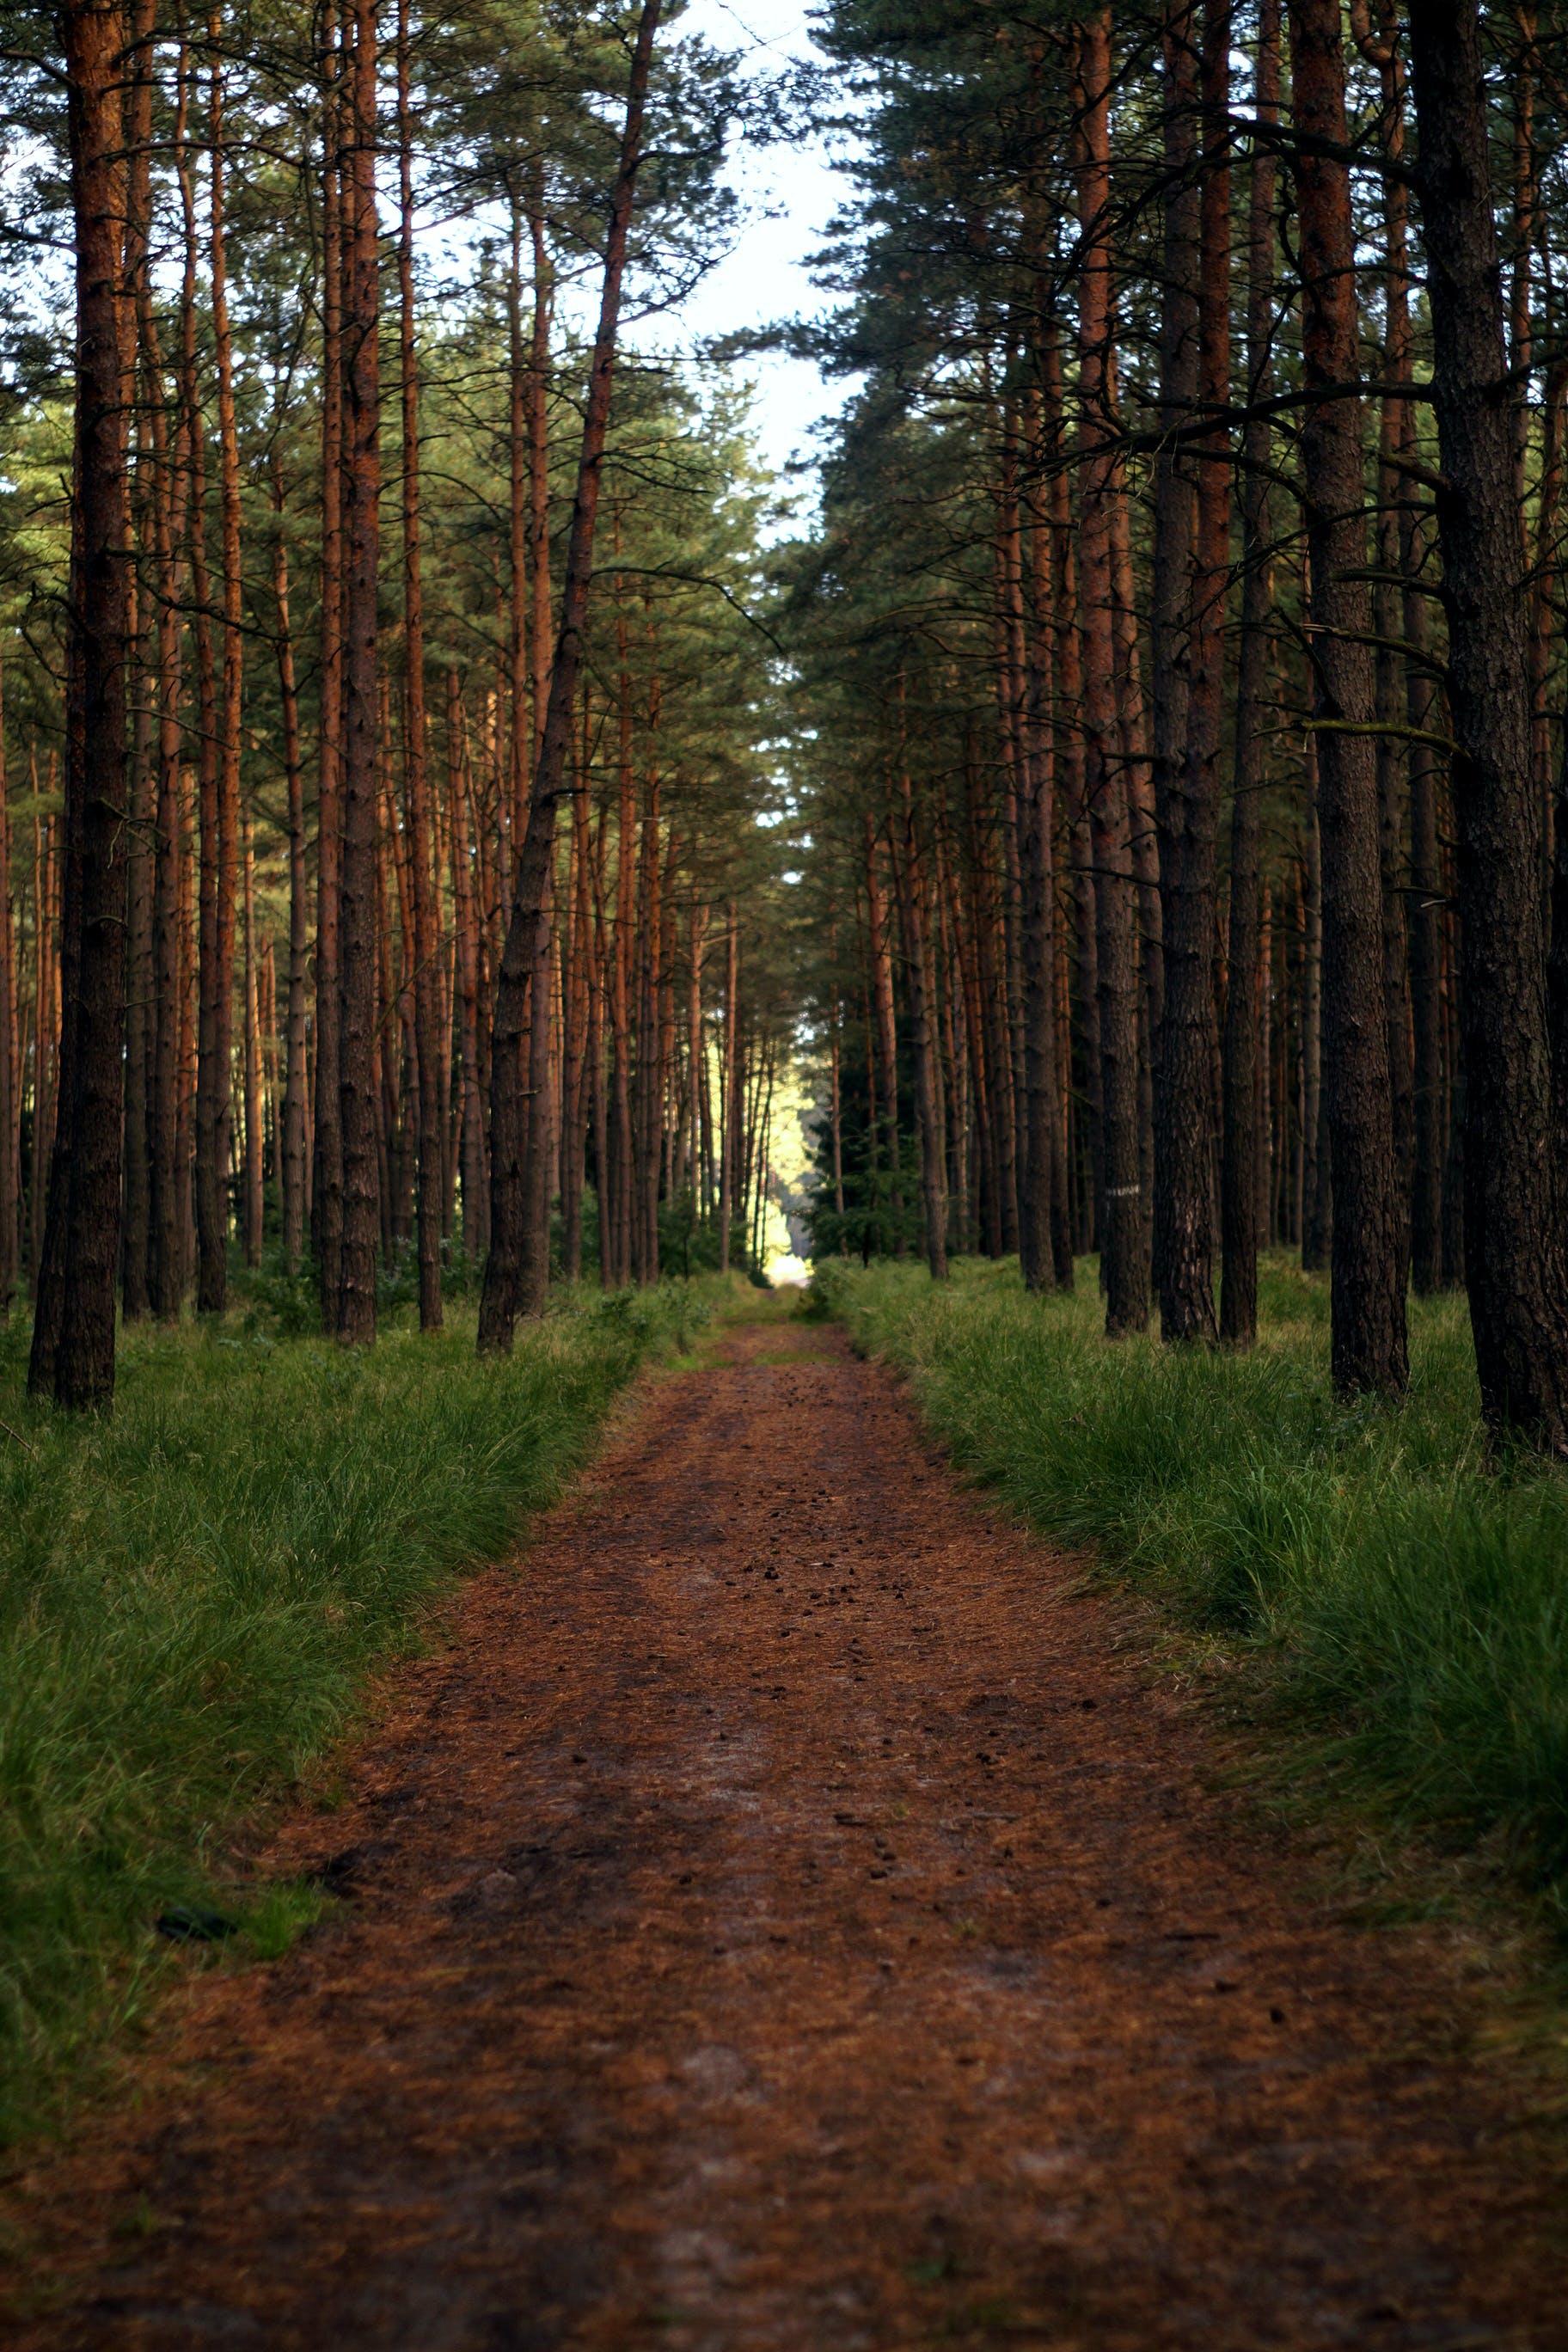 Kostenloses Stock Foto zu bäume, gras, holz, kiefer